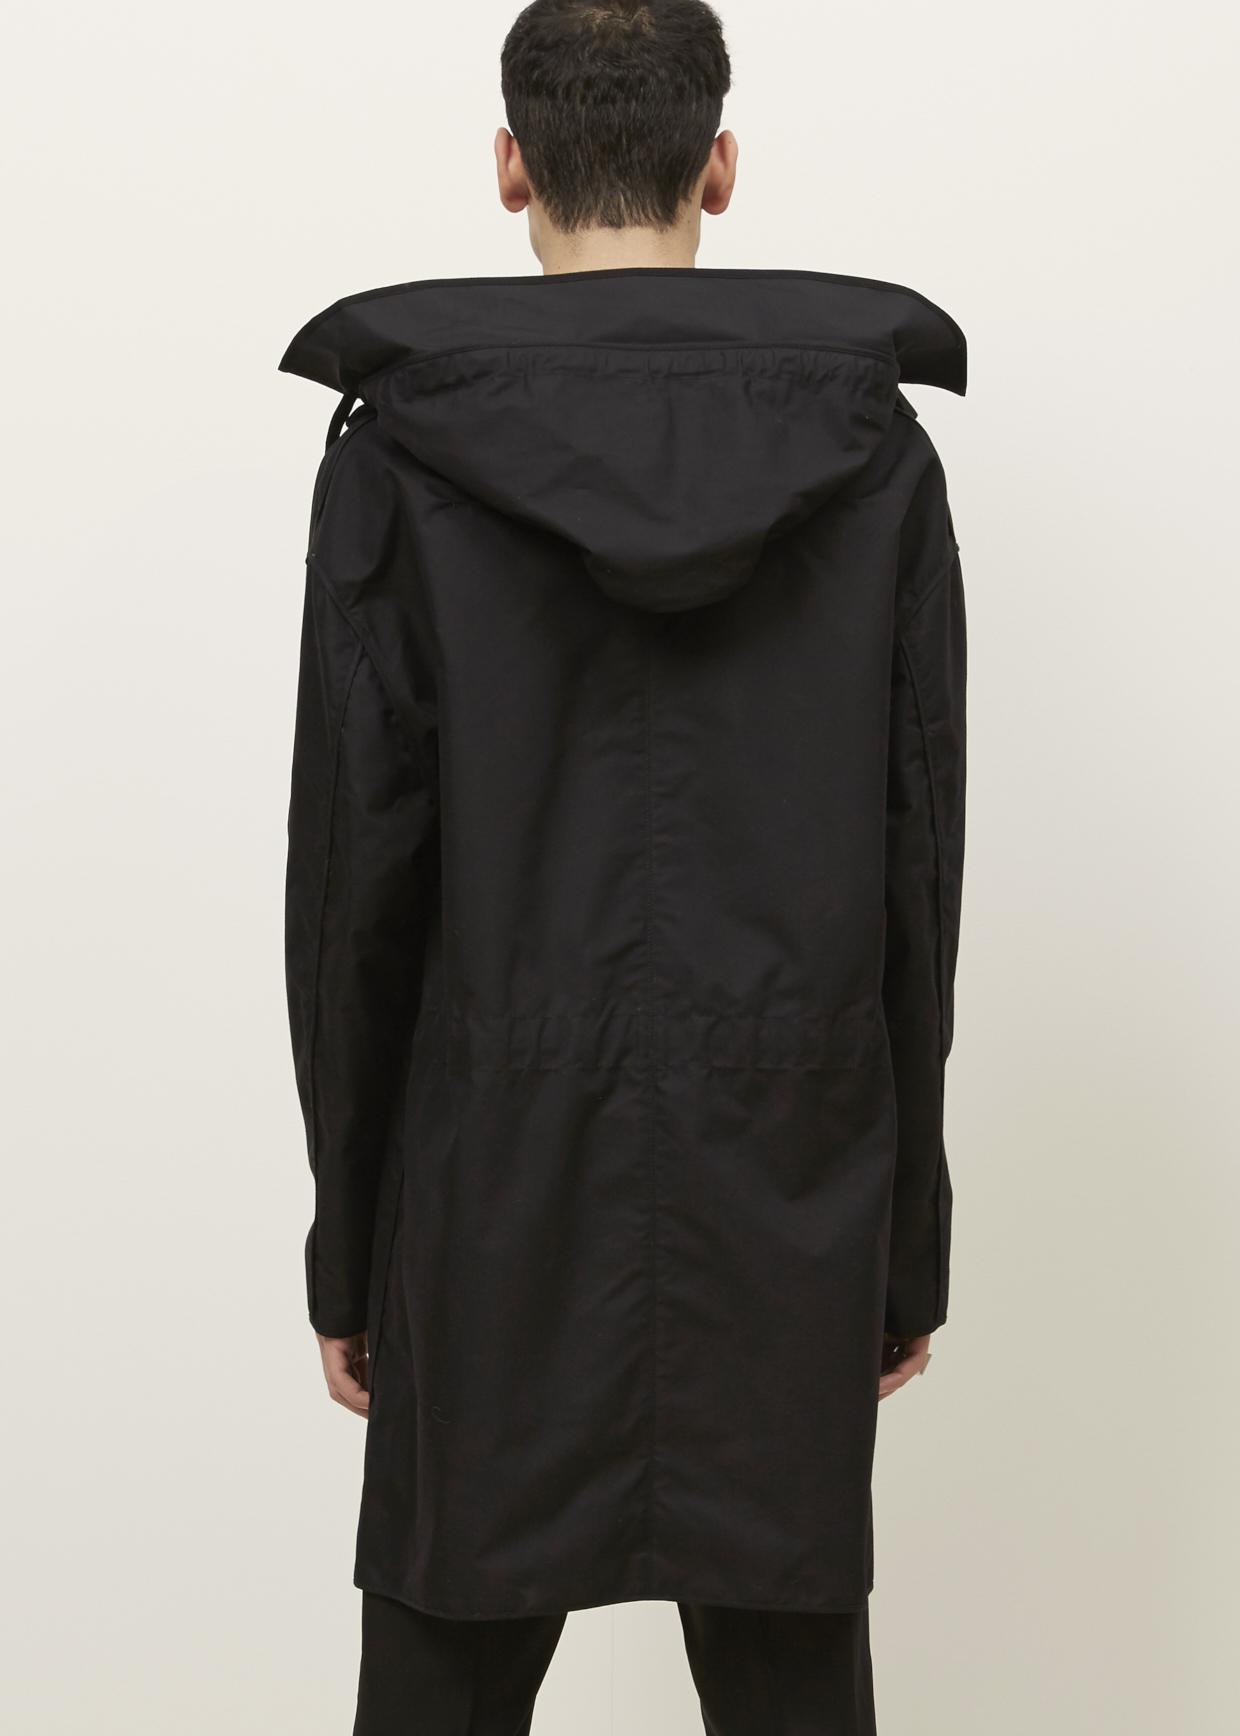 Lanvin Black Tech Cotton Duffle Coat in Black for Men | Lyst